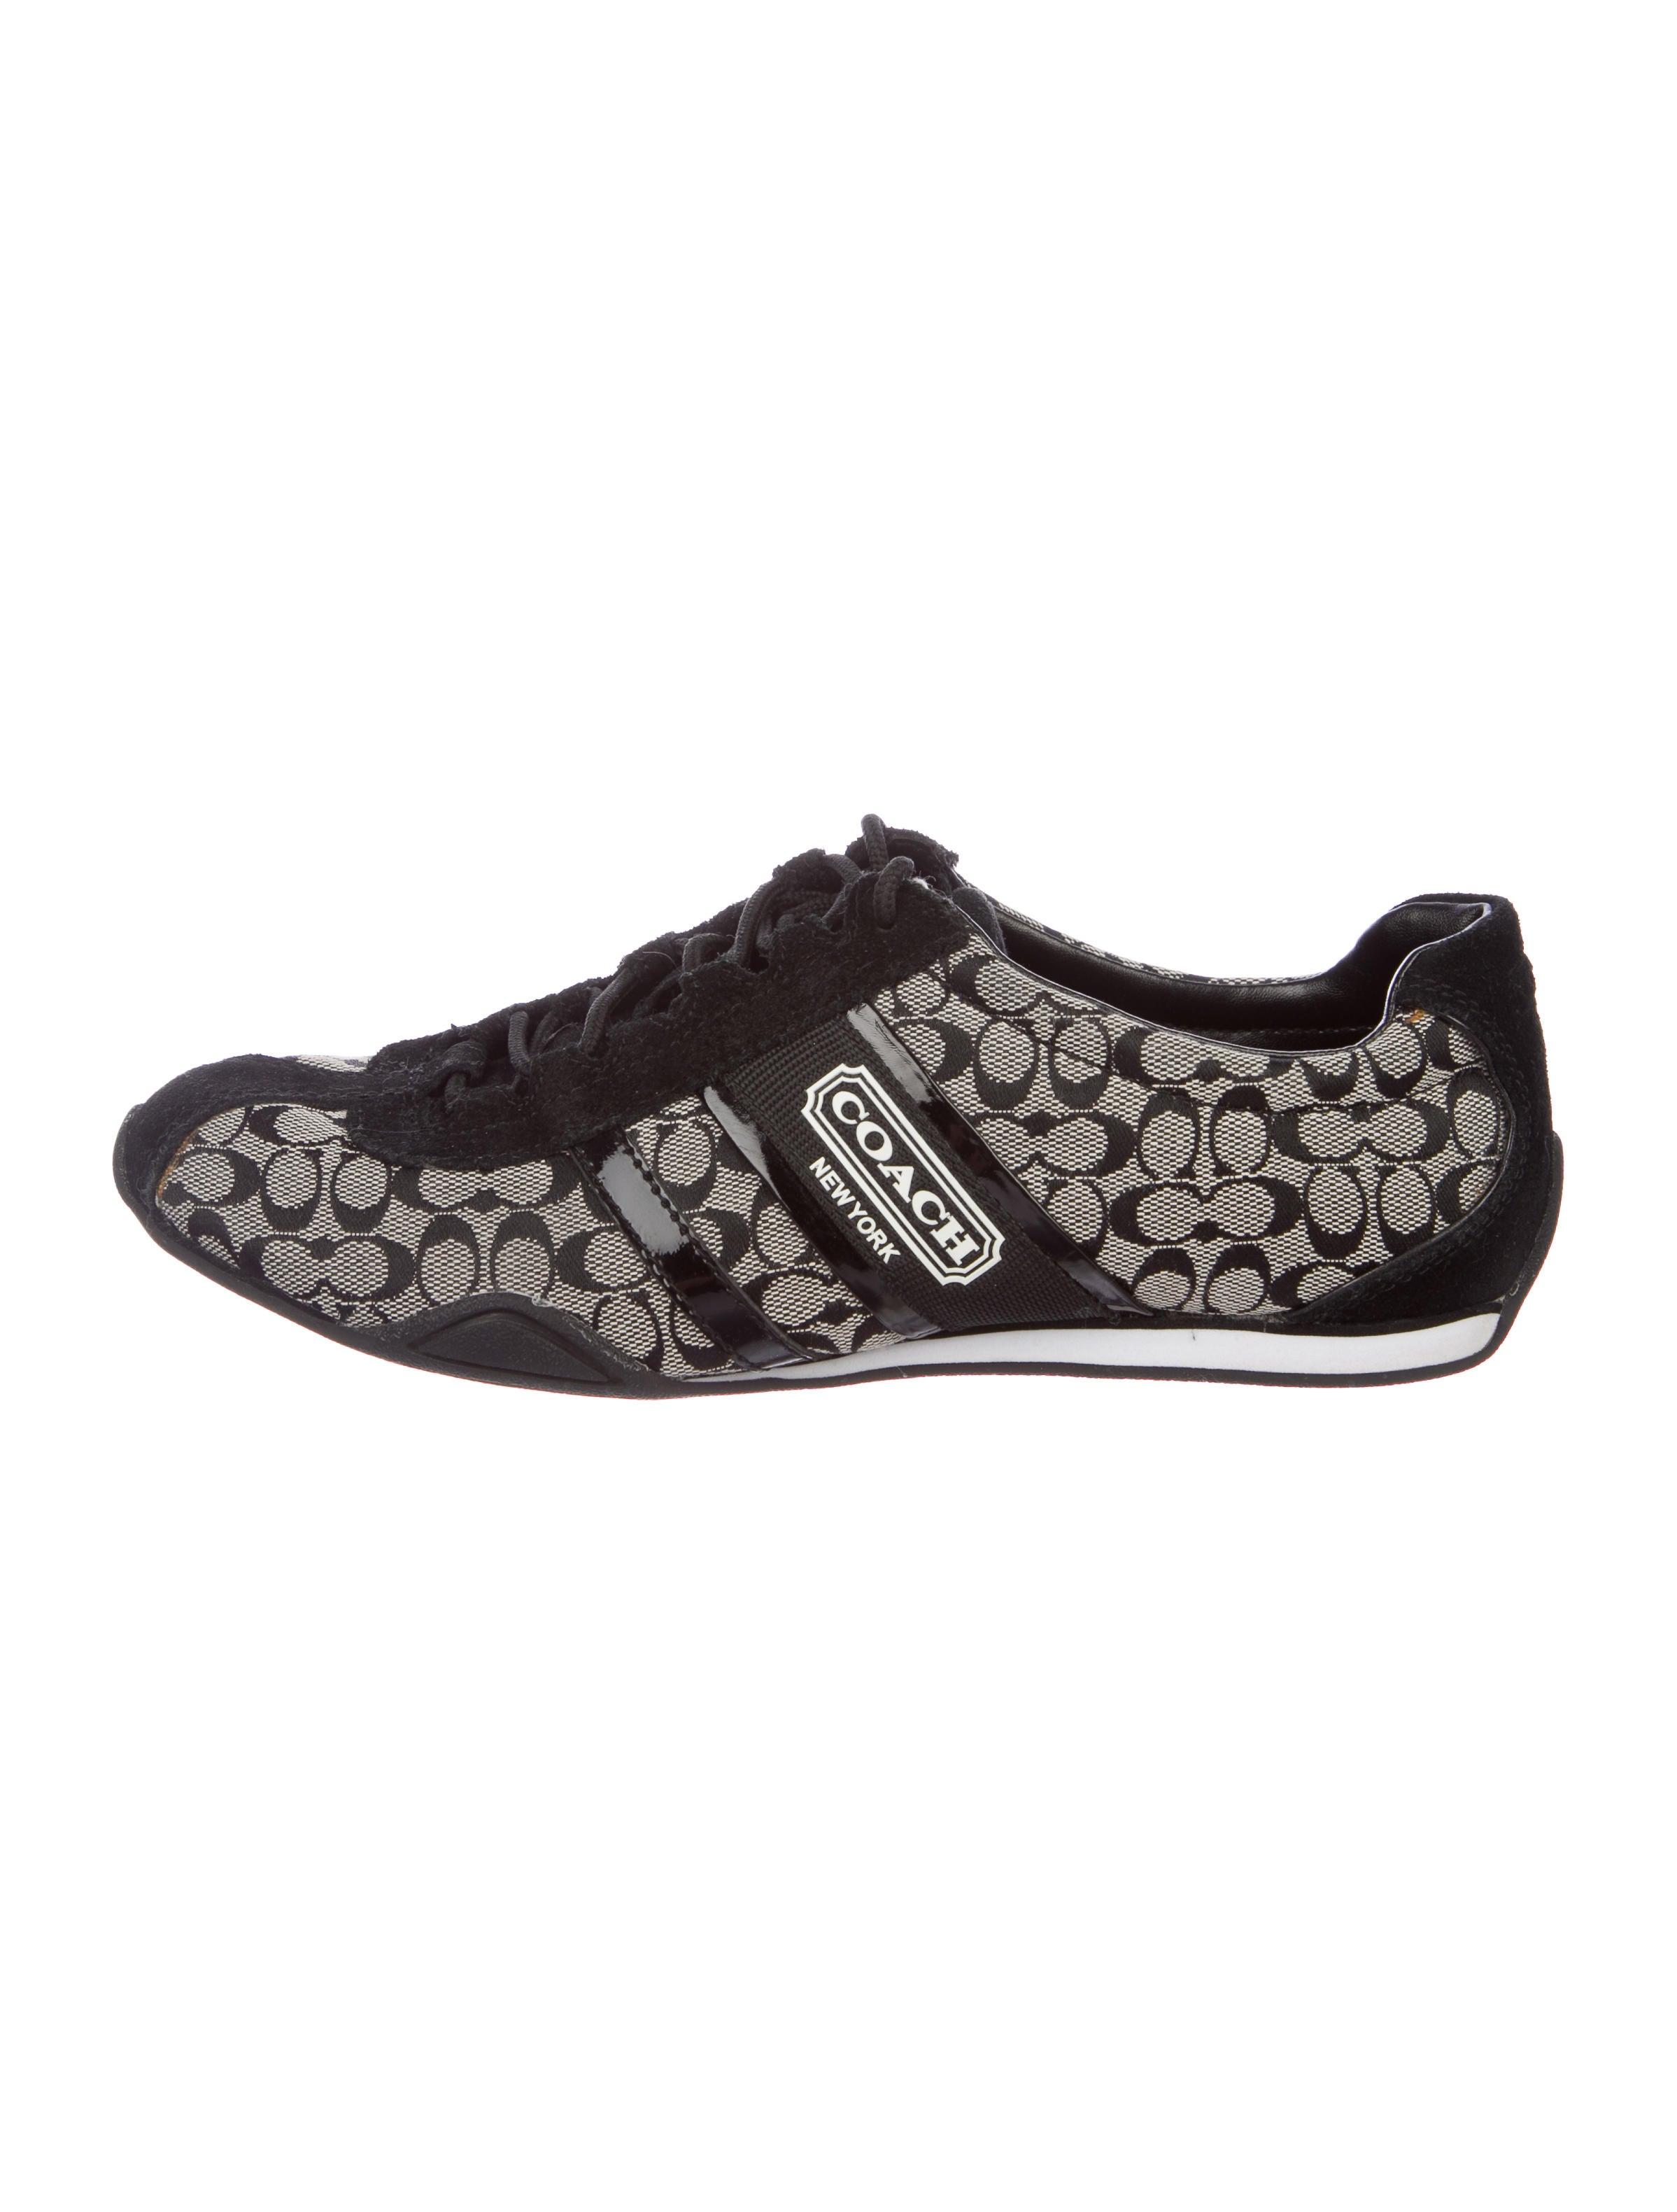 Coach Remonna Monogram Sneakers for sale top quality 1xcCmbC